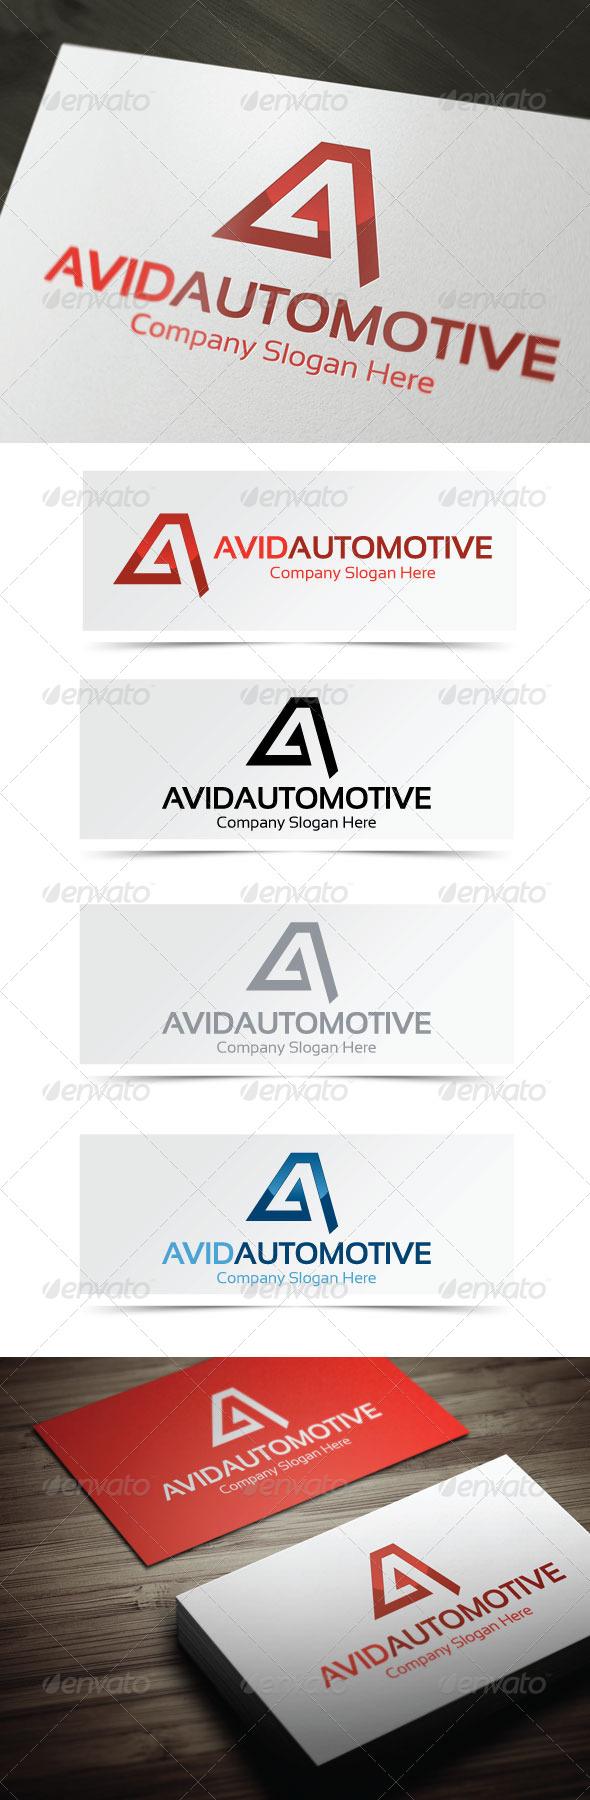 Avid Automotive - Letters Logo Templates